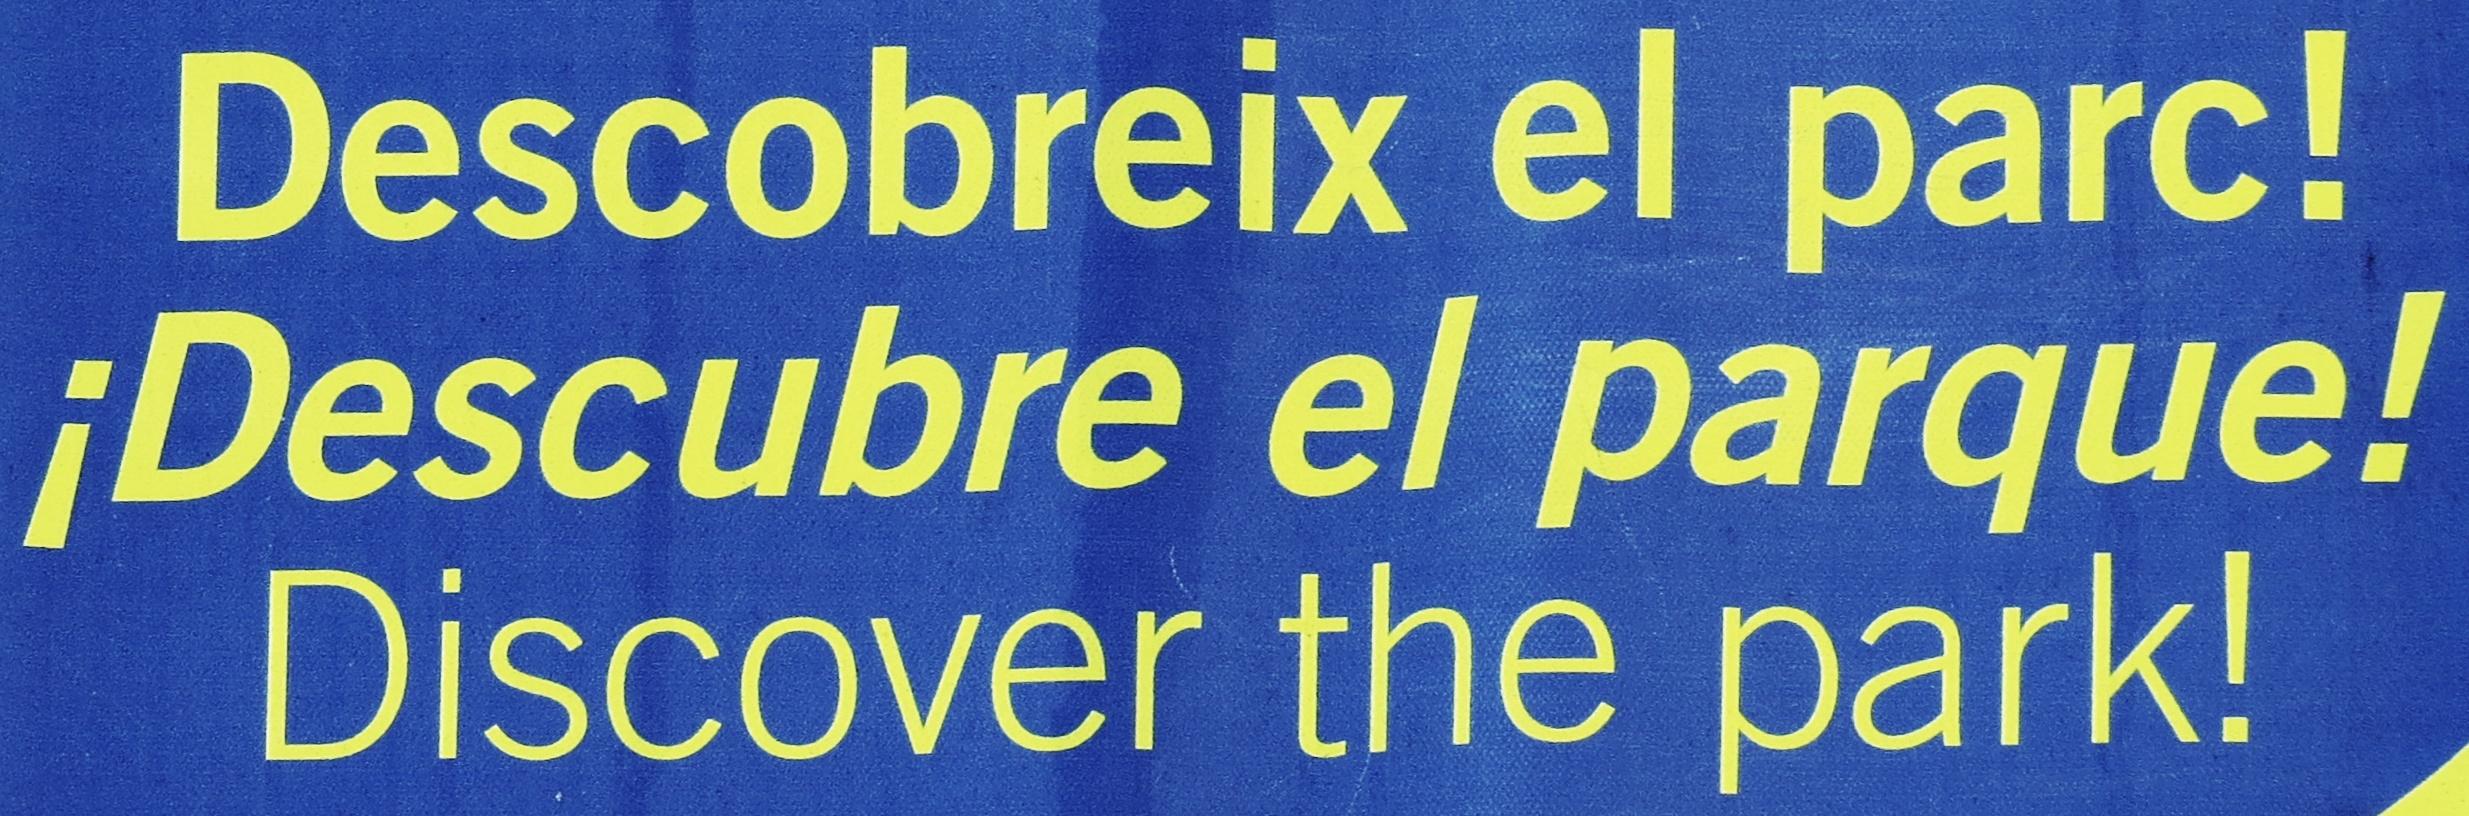 rilingualbillboardinarcelonadetail,showingtheinitialexclamationmarkforpanish,butnotforatalanatalanlanguagetoplineandnglish.